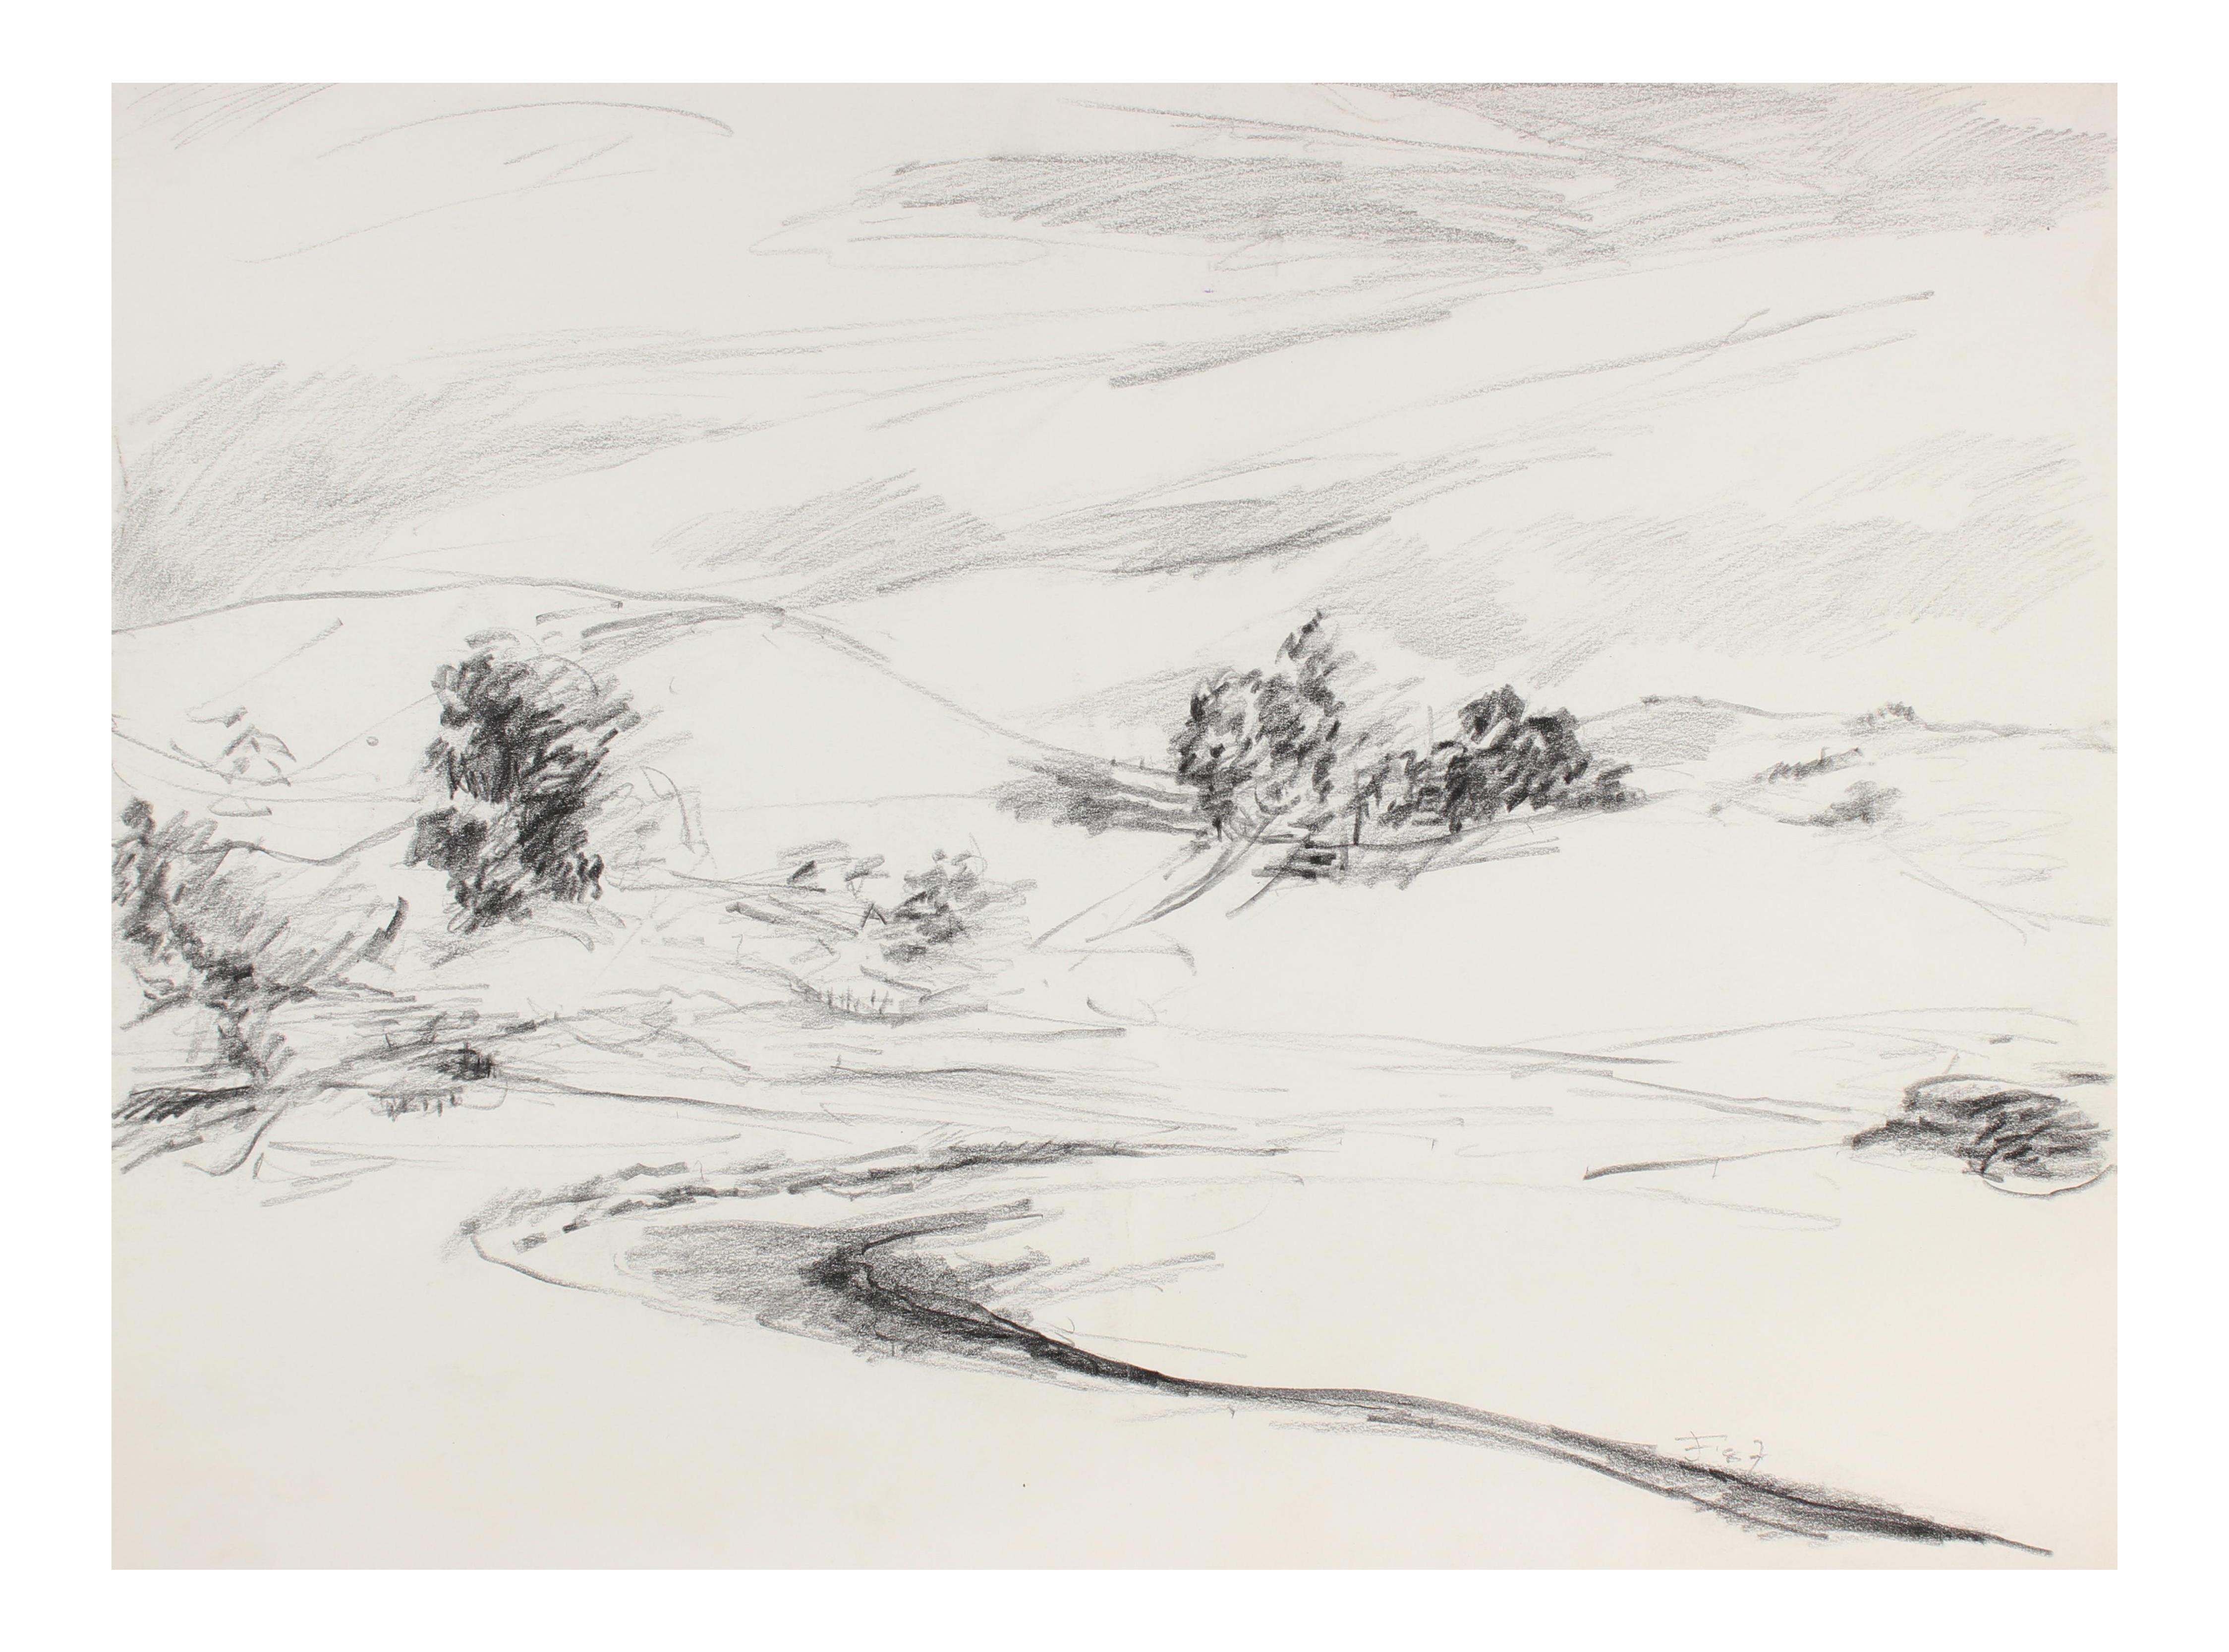 clip art free download Drawing charcoal minimalist. California landscape in chairish